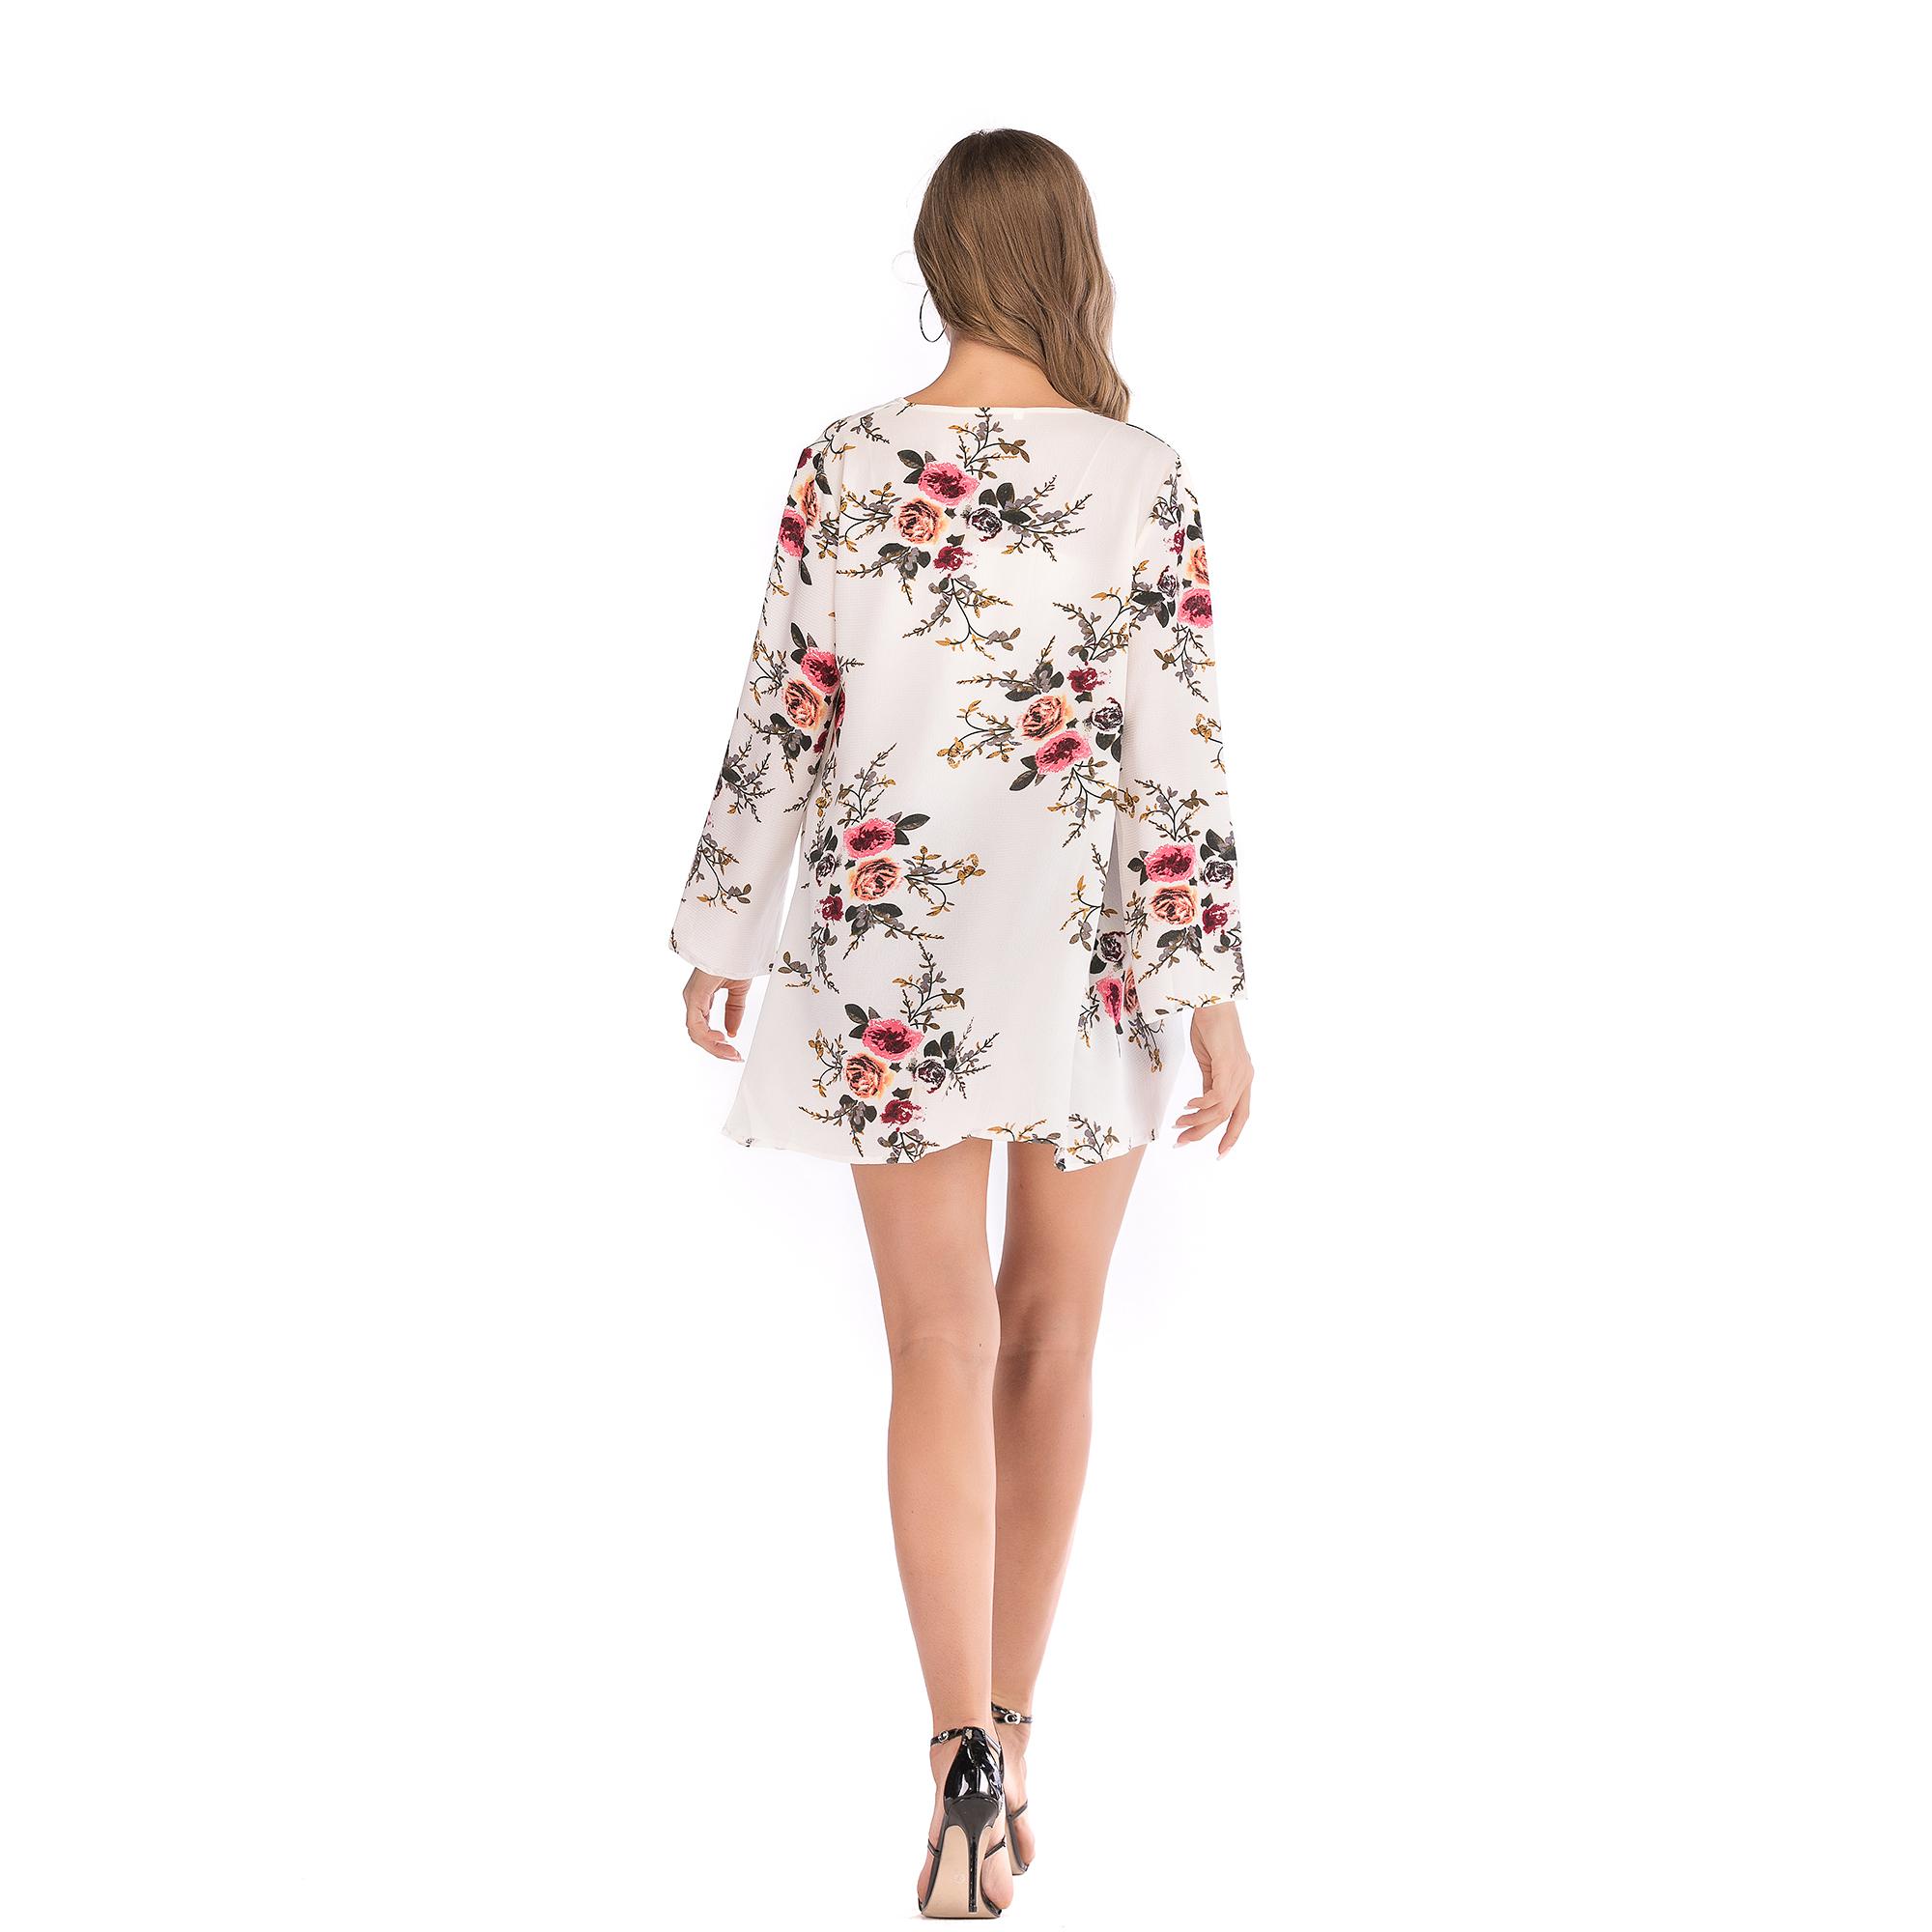 Fashion-Women-Loose-Blouse-Kimono-Cardigan-Tops-Summer-Bikini-Cover-Up-Wrap-Coat thumbnail 33